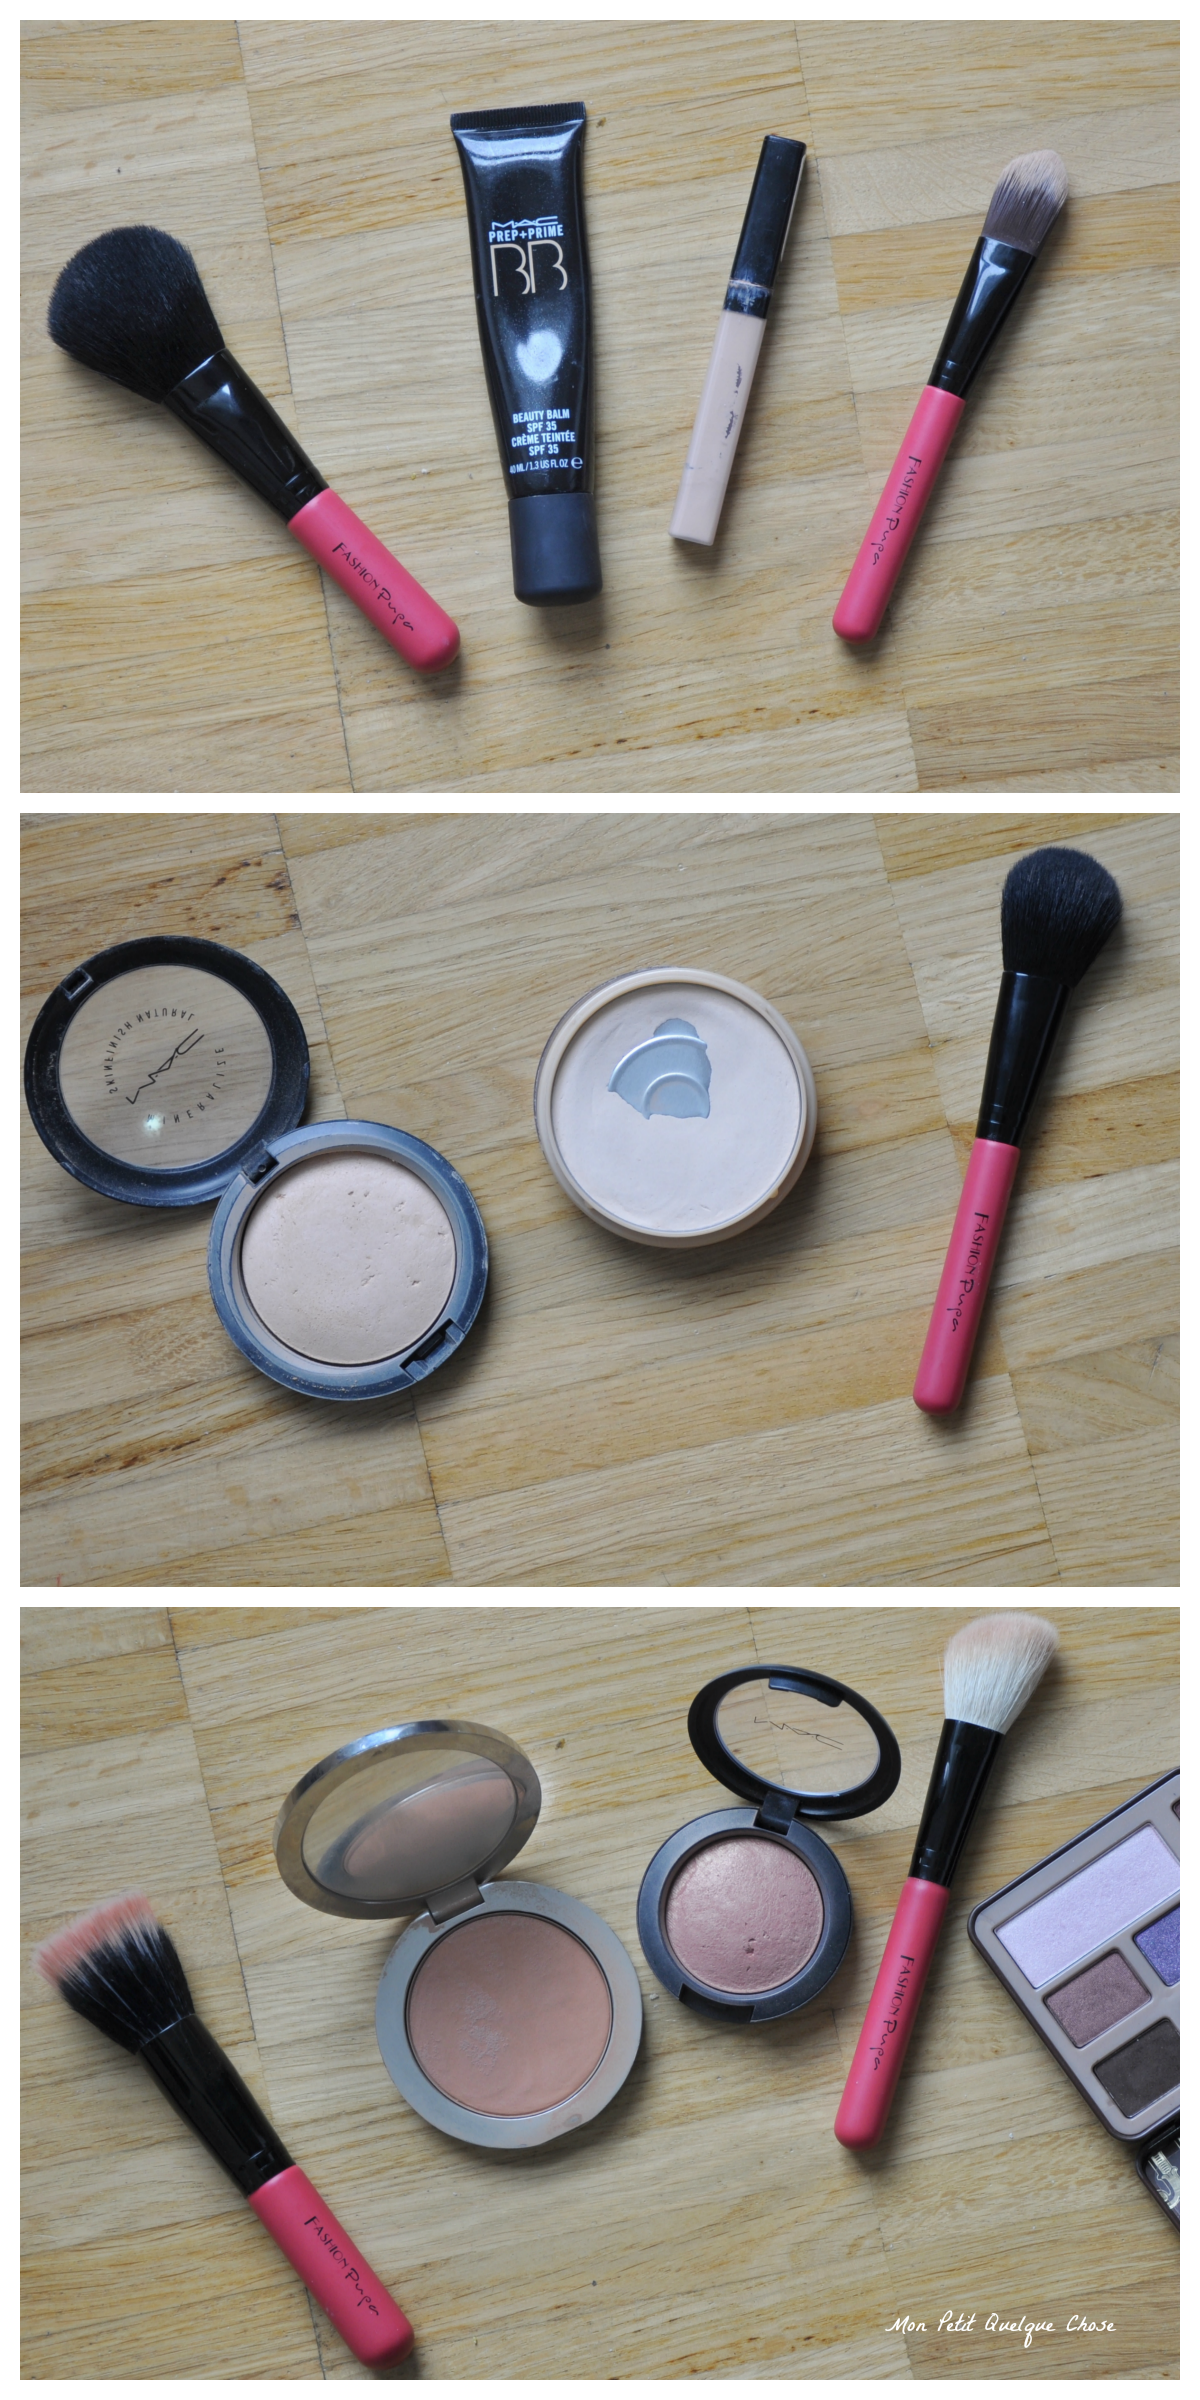 FashionPupa, Sweet Pink Brush Set, Mon Petit Quelque Chose